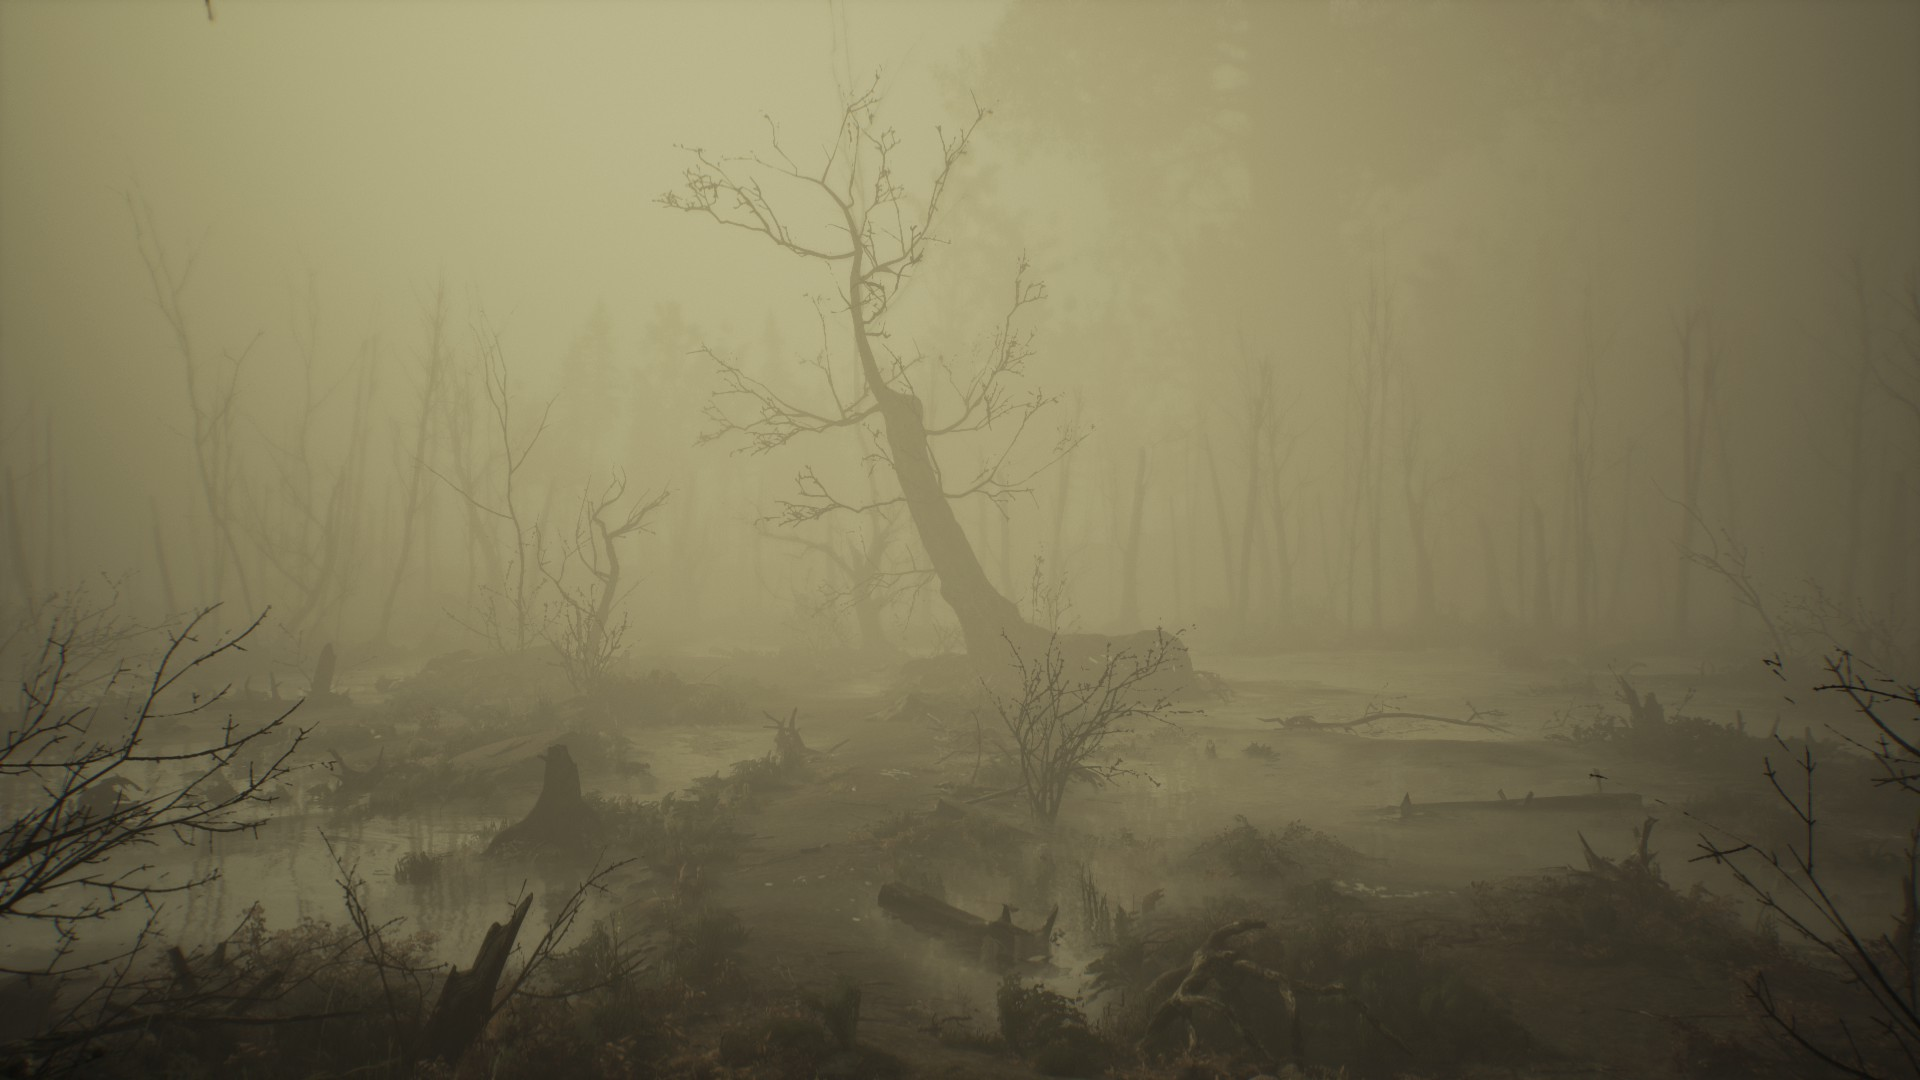 Un arbre mort dans la brume.